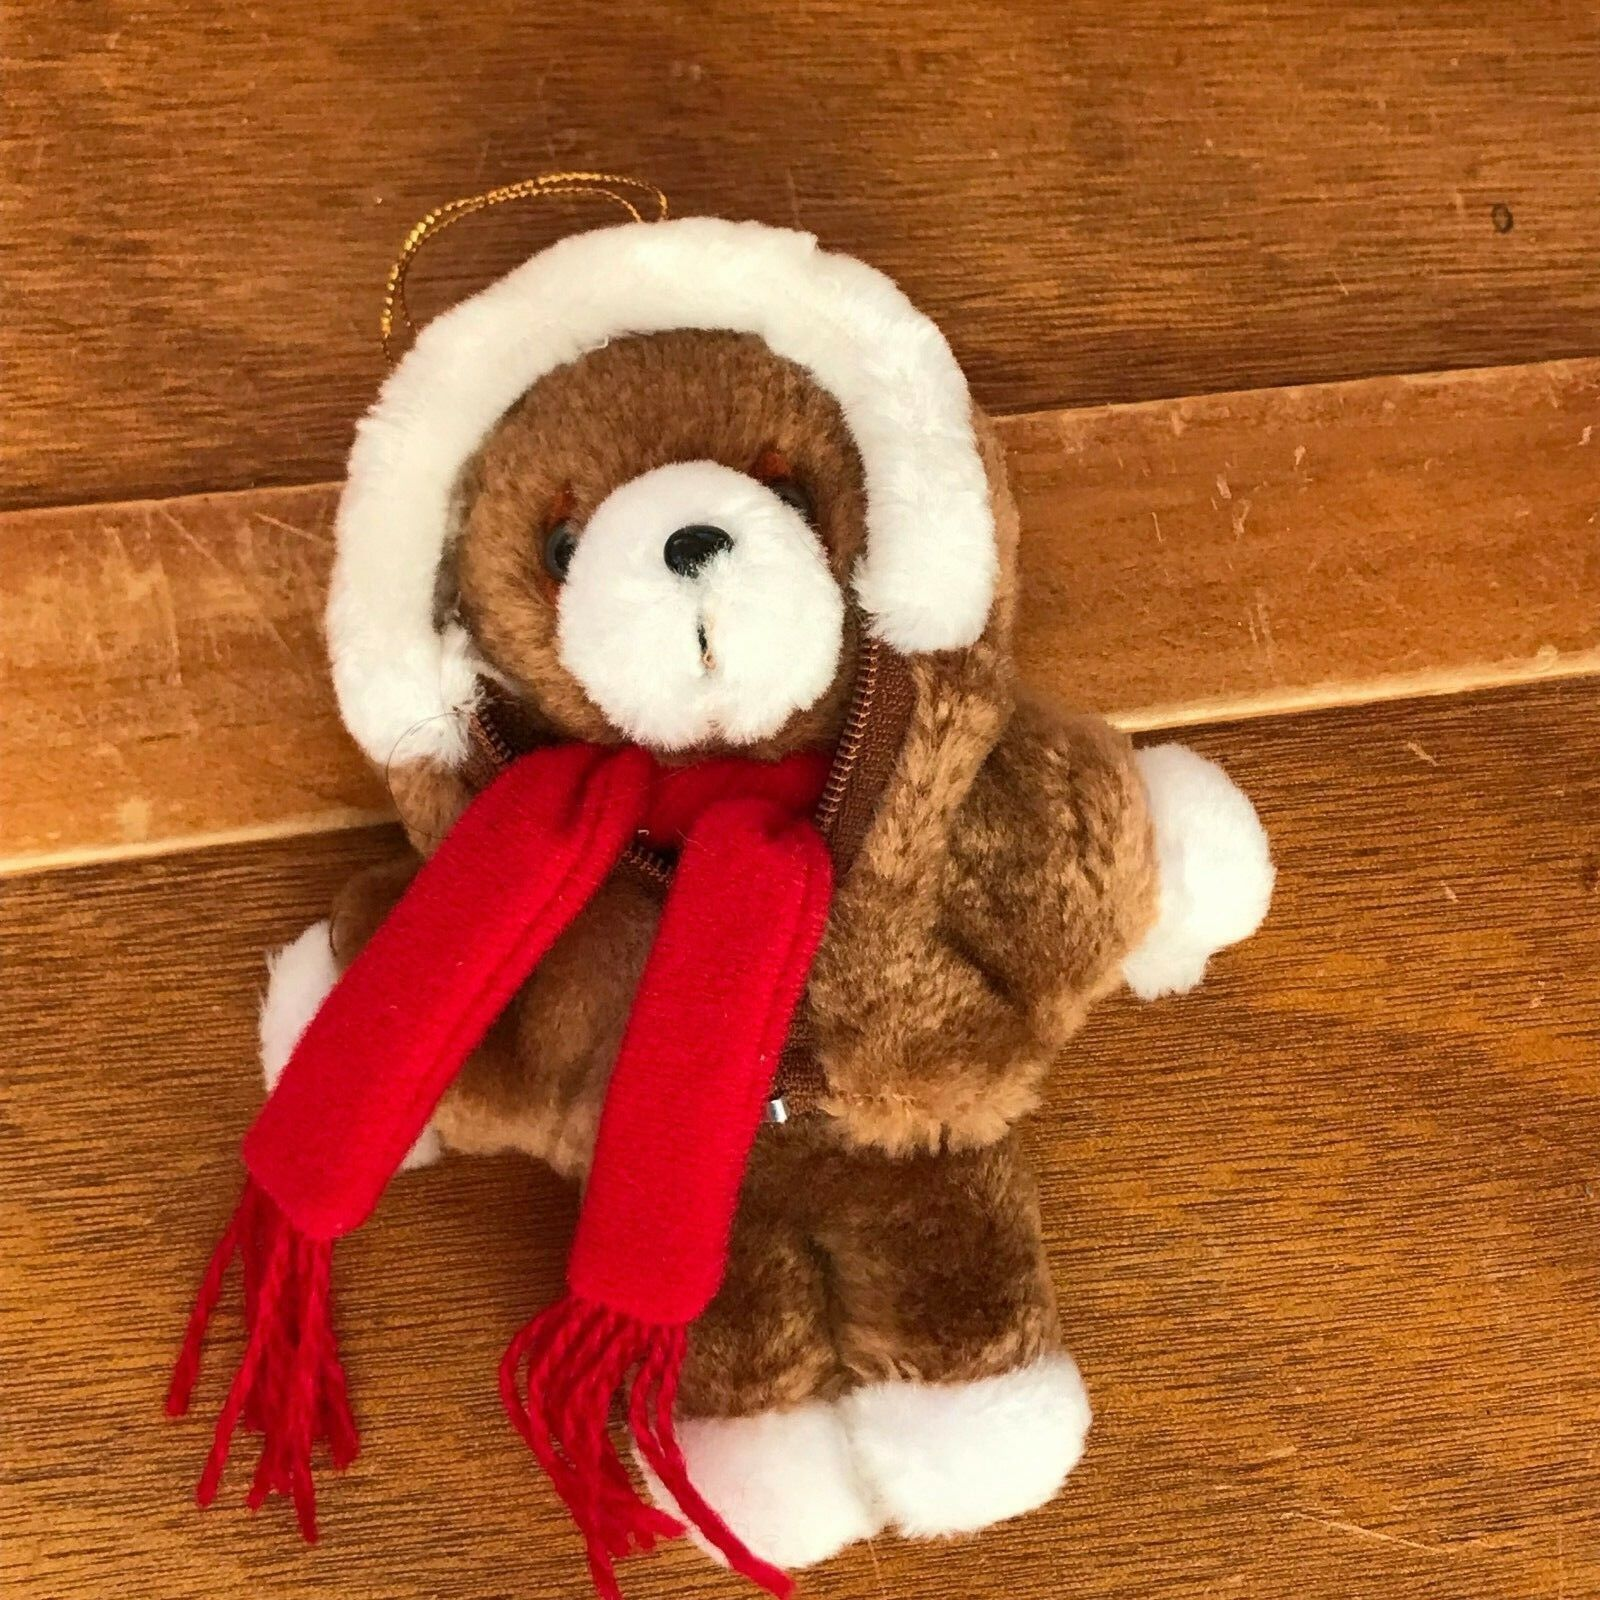 Vintage Avon Small Brown Teddy Bear w Zip Hoodie & Red Scarf Plush Stuffed Anima